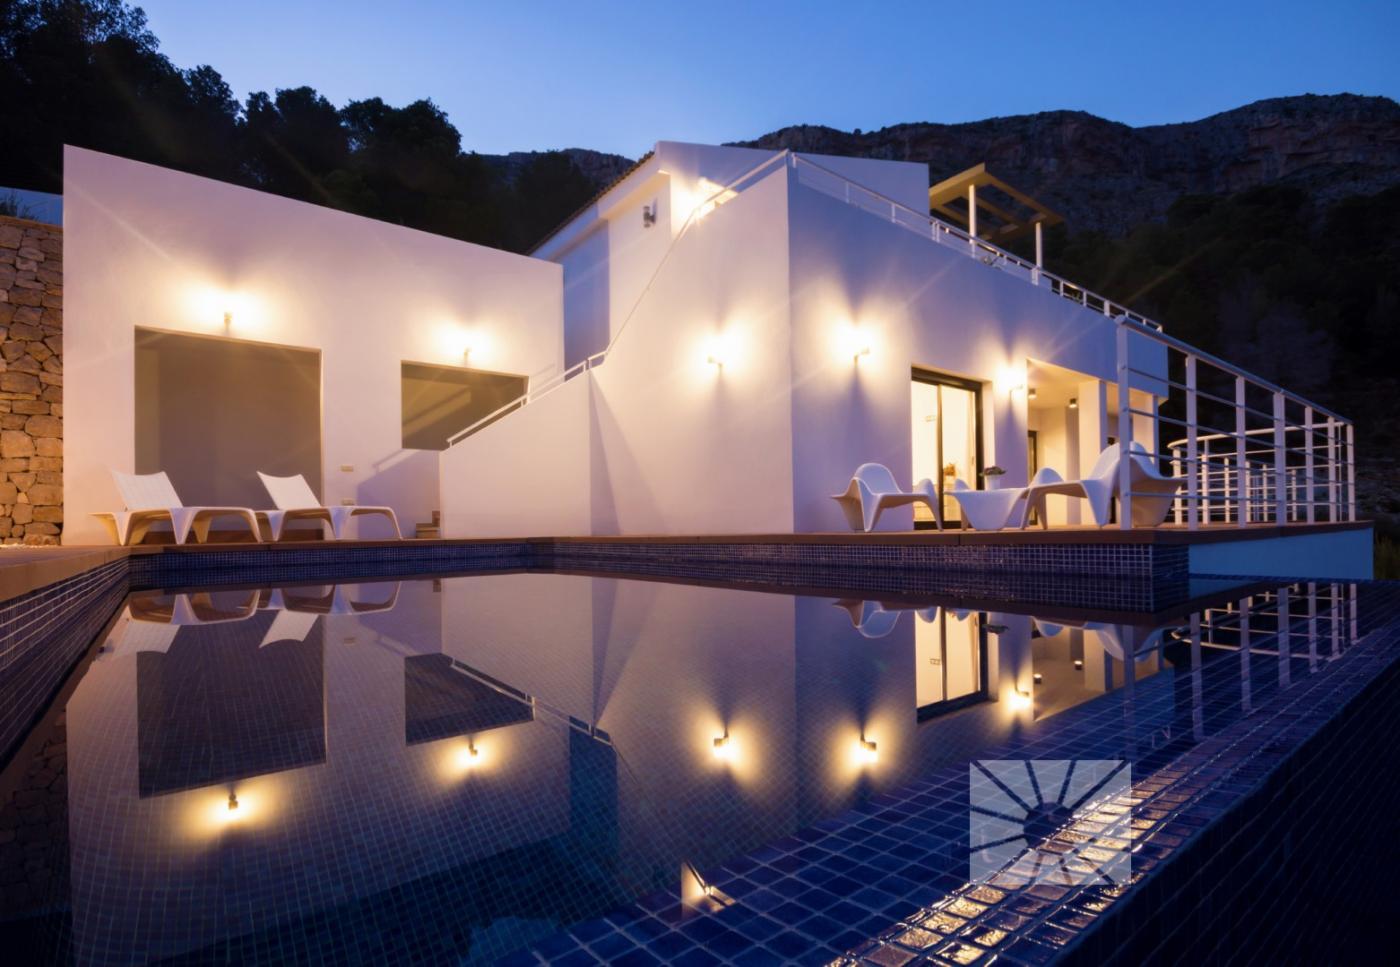 Villas for sale in Altea - 5 exclusive villas in a gated complex, with fantastic sea views, currentl,Spain